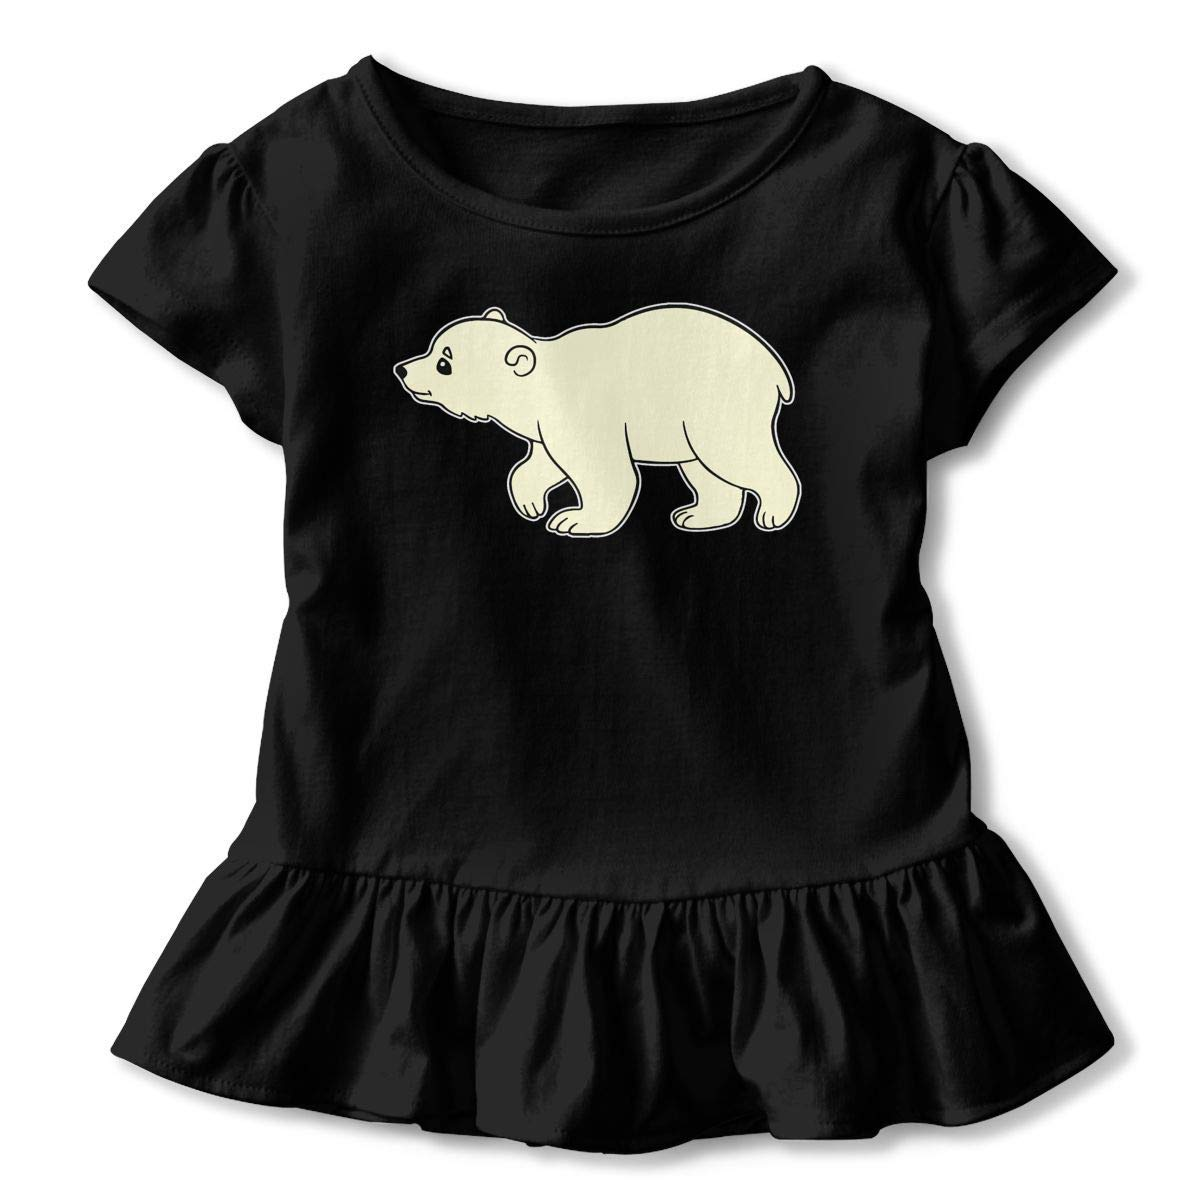 2-6T Ruffled Tunic Tops with Falbala PMsunglasses Short Sleeve Bear Baby Cub Shirts for Girls